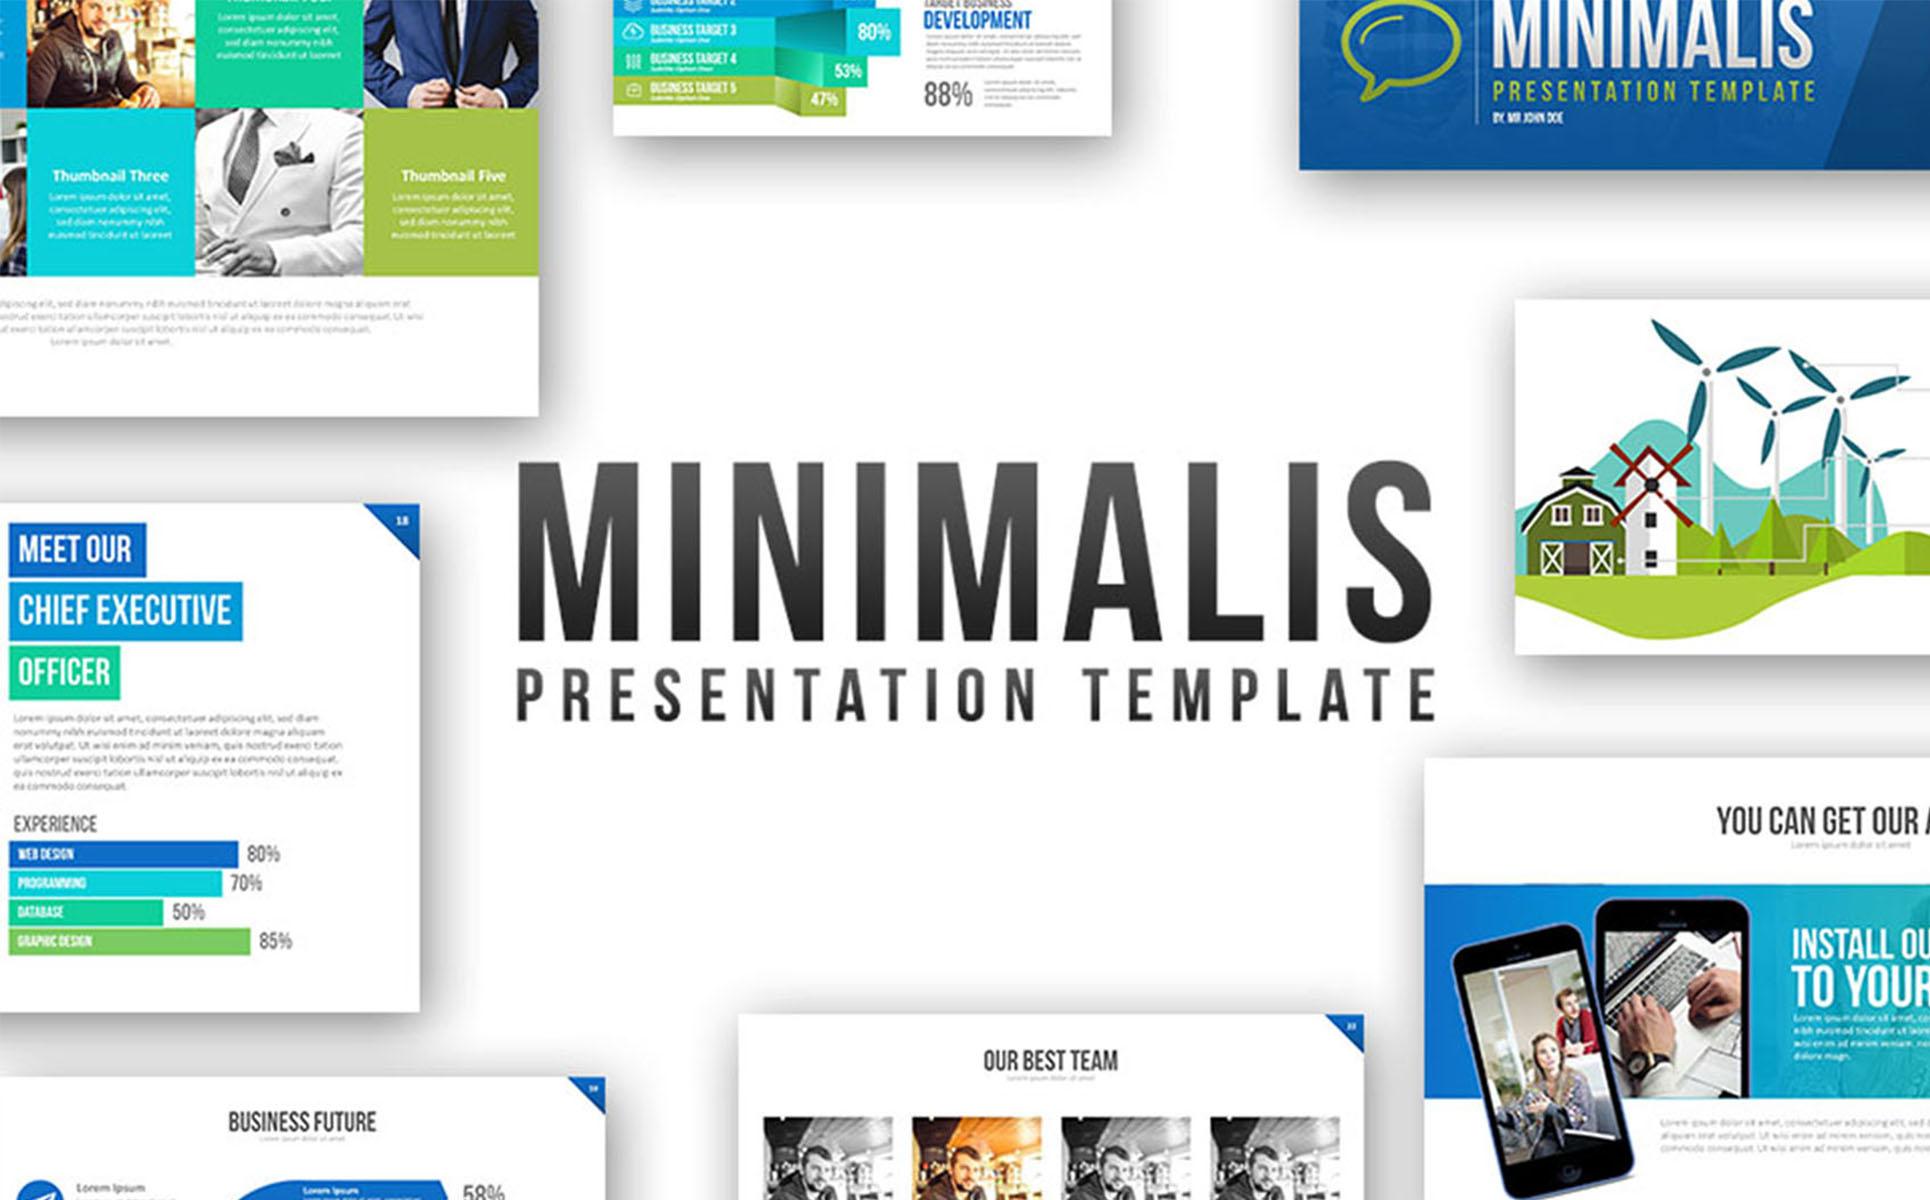 minimalis powerpoint template powerpoint template #64631, Modern powerpoint